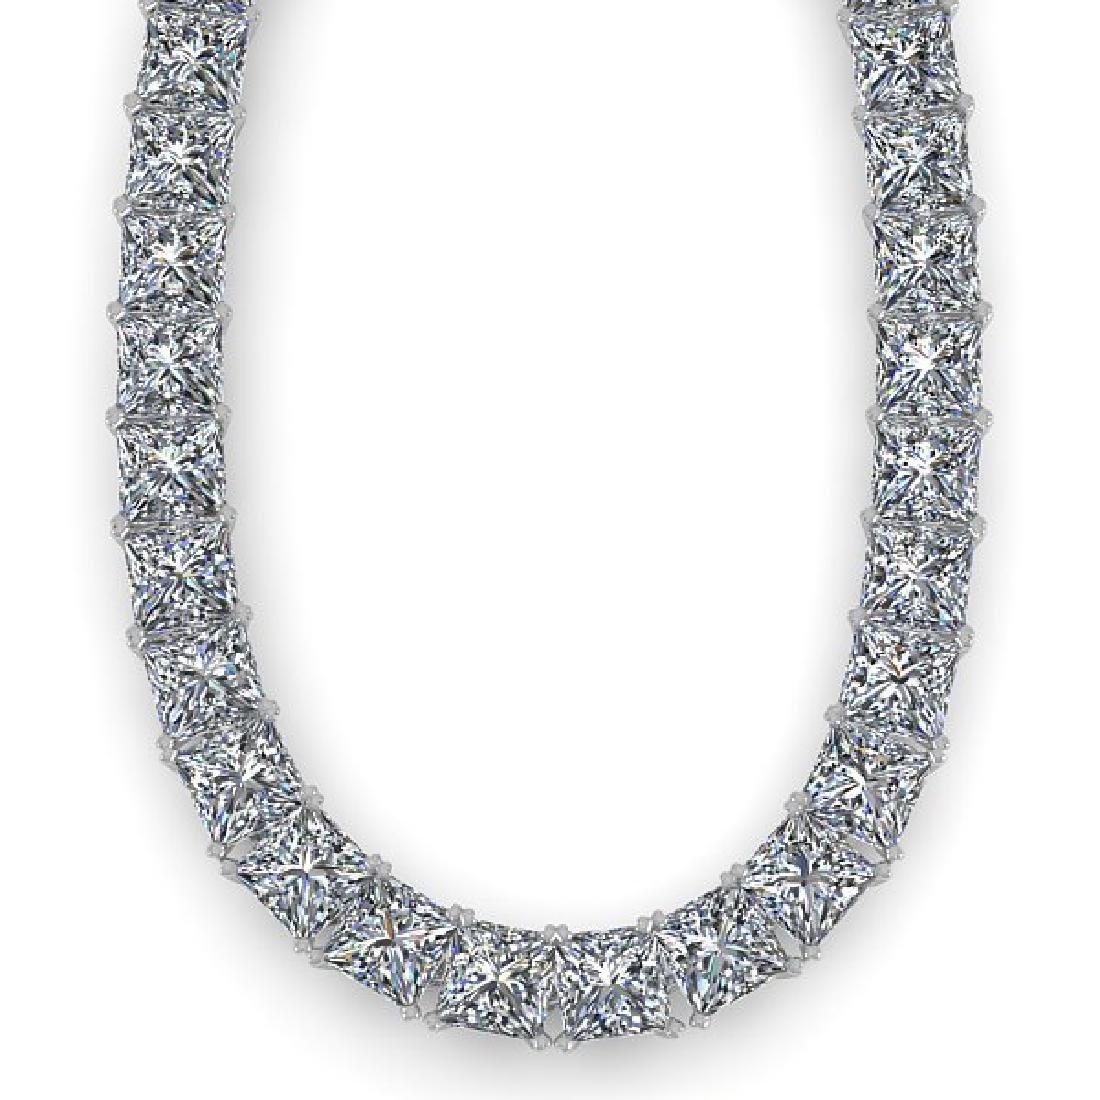 40 CTW Princess Certified SI Diamond Necklace 18K Rose - 2